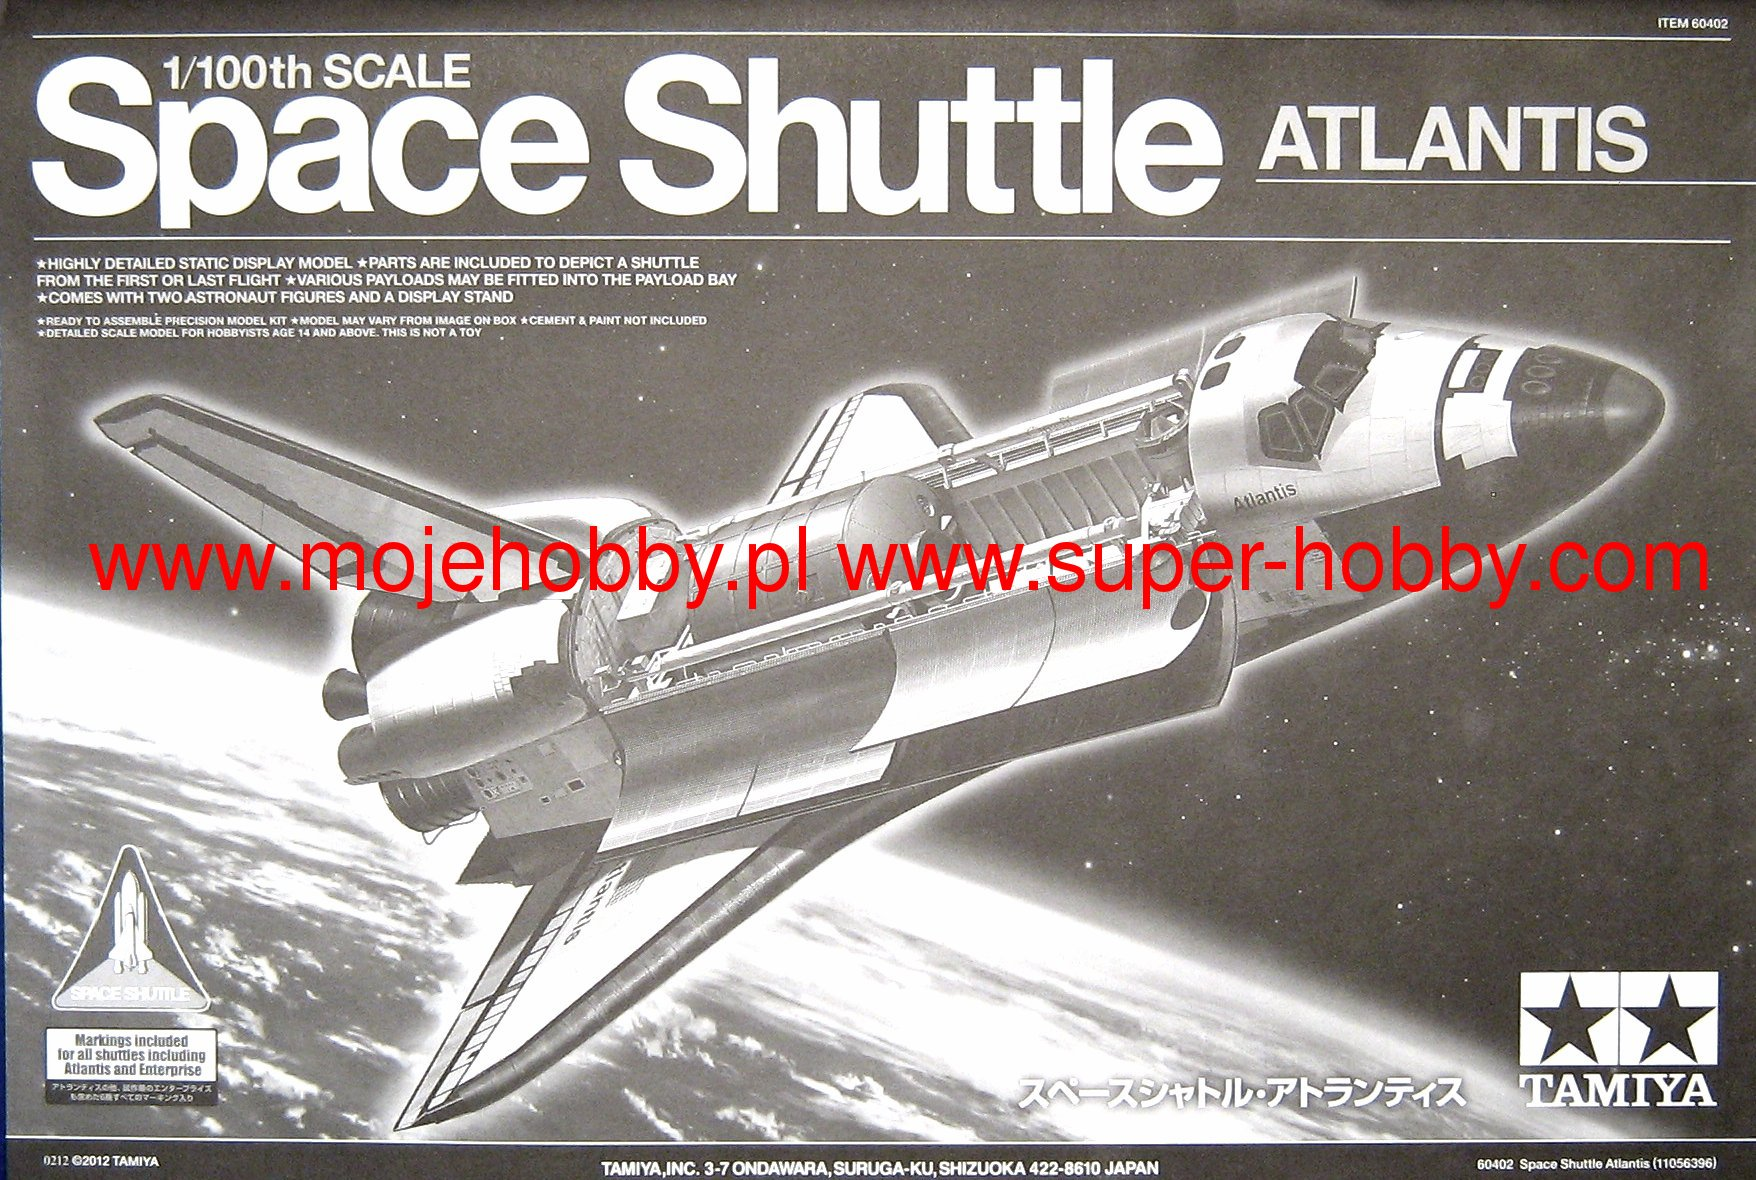 tamiya 60402 space shuttle atlantis - photo #13